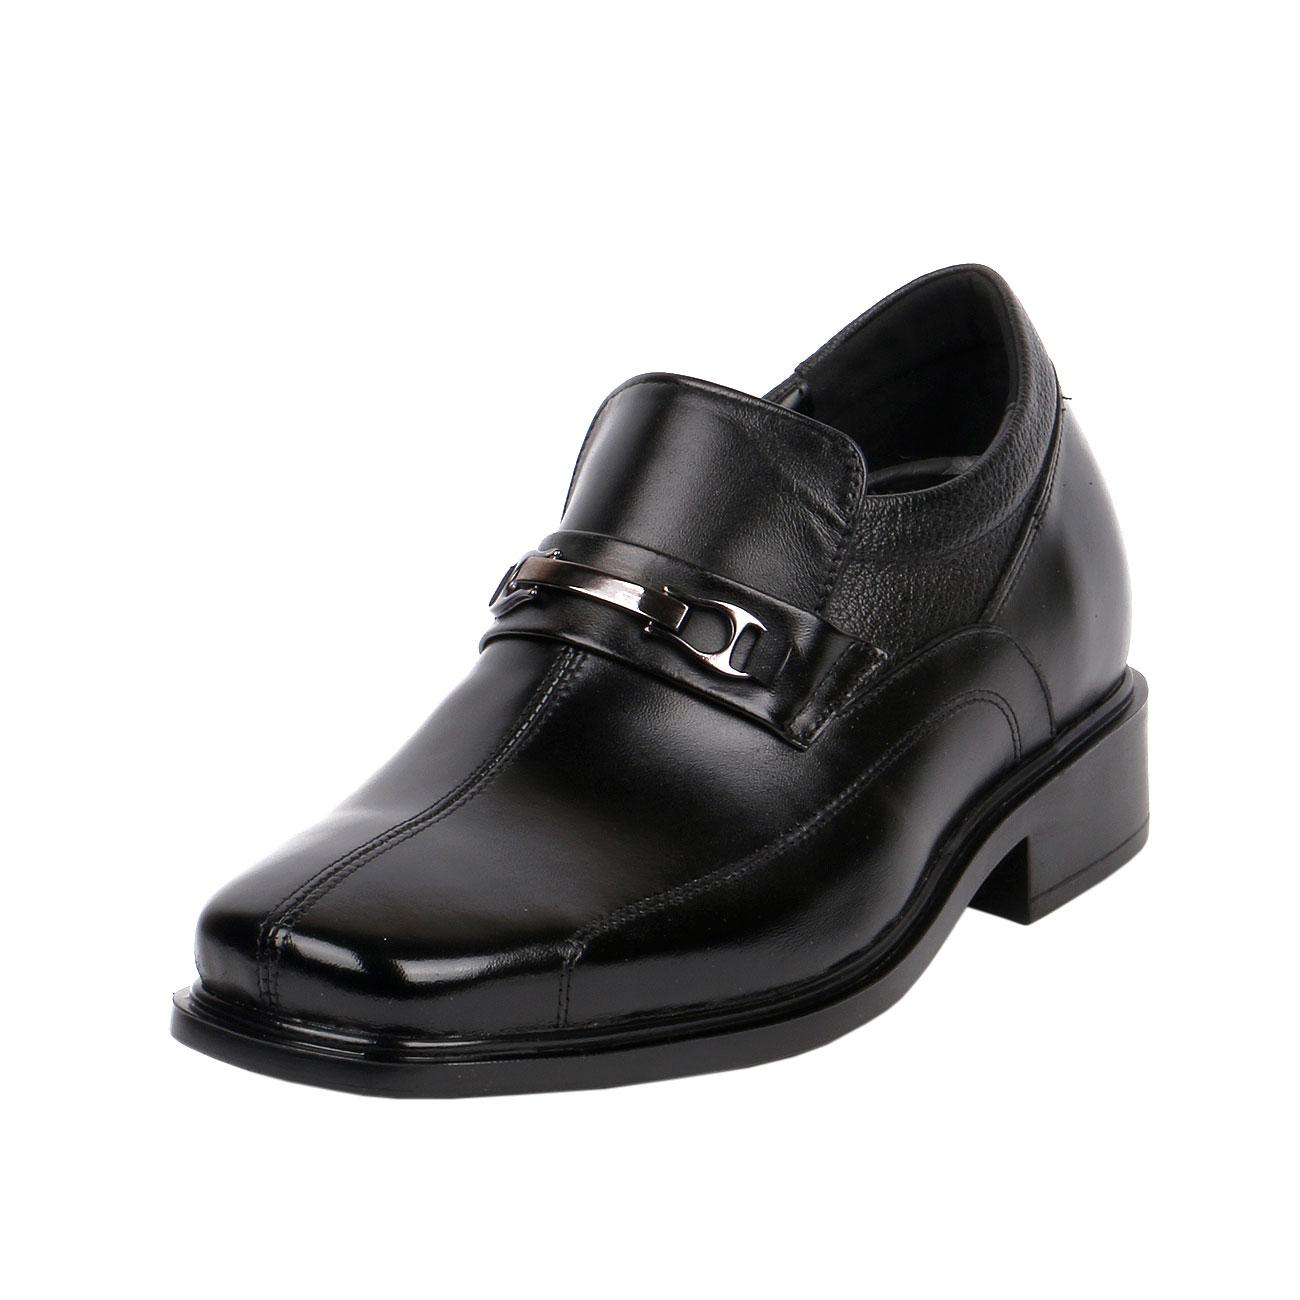 KL602, Limited Version of Metal Bit Loafer More Attractive Gentlemen Make An Effort To Look Good-1